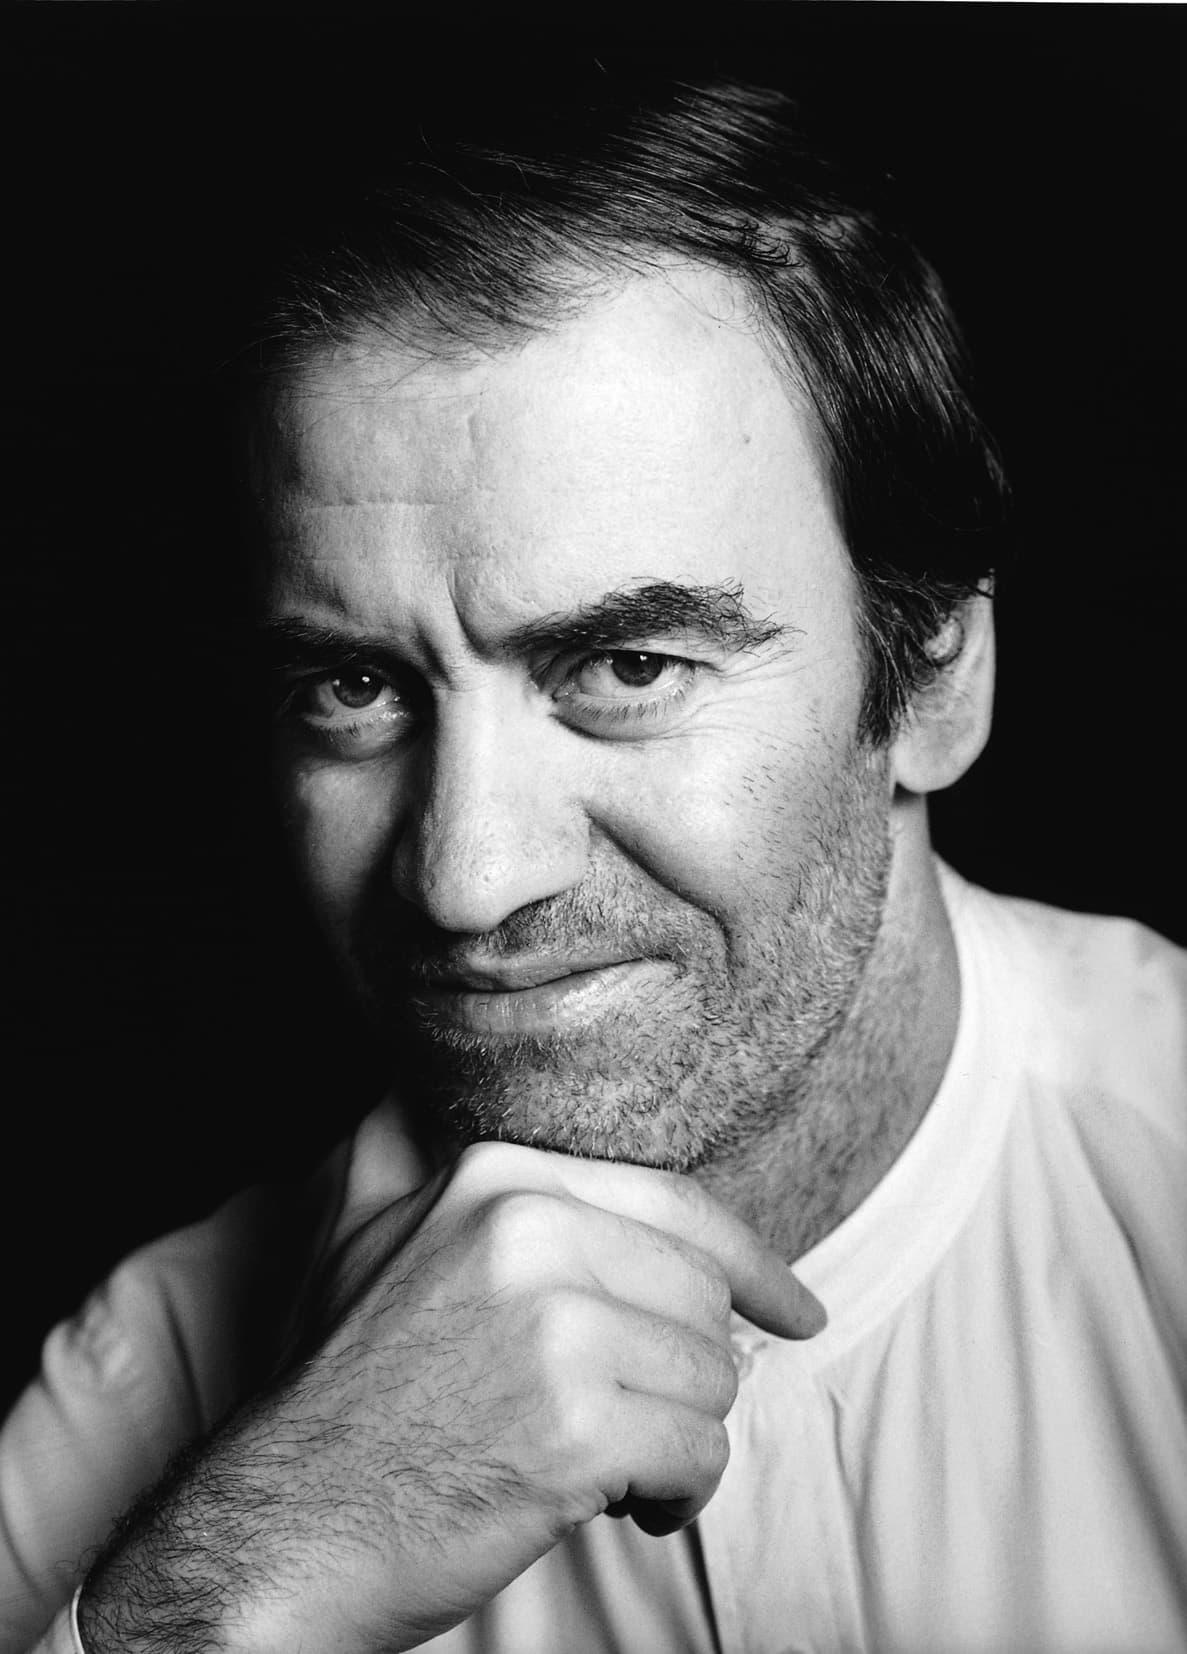 Dirigent Valery Gergiev